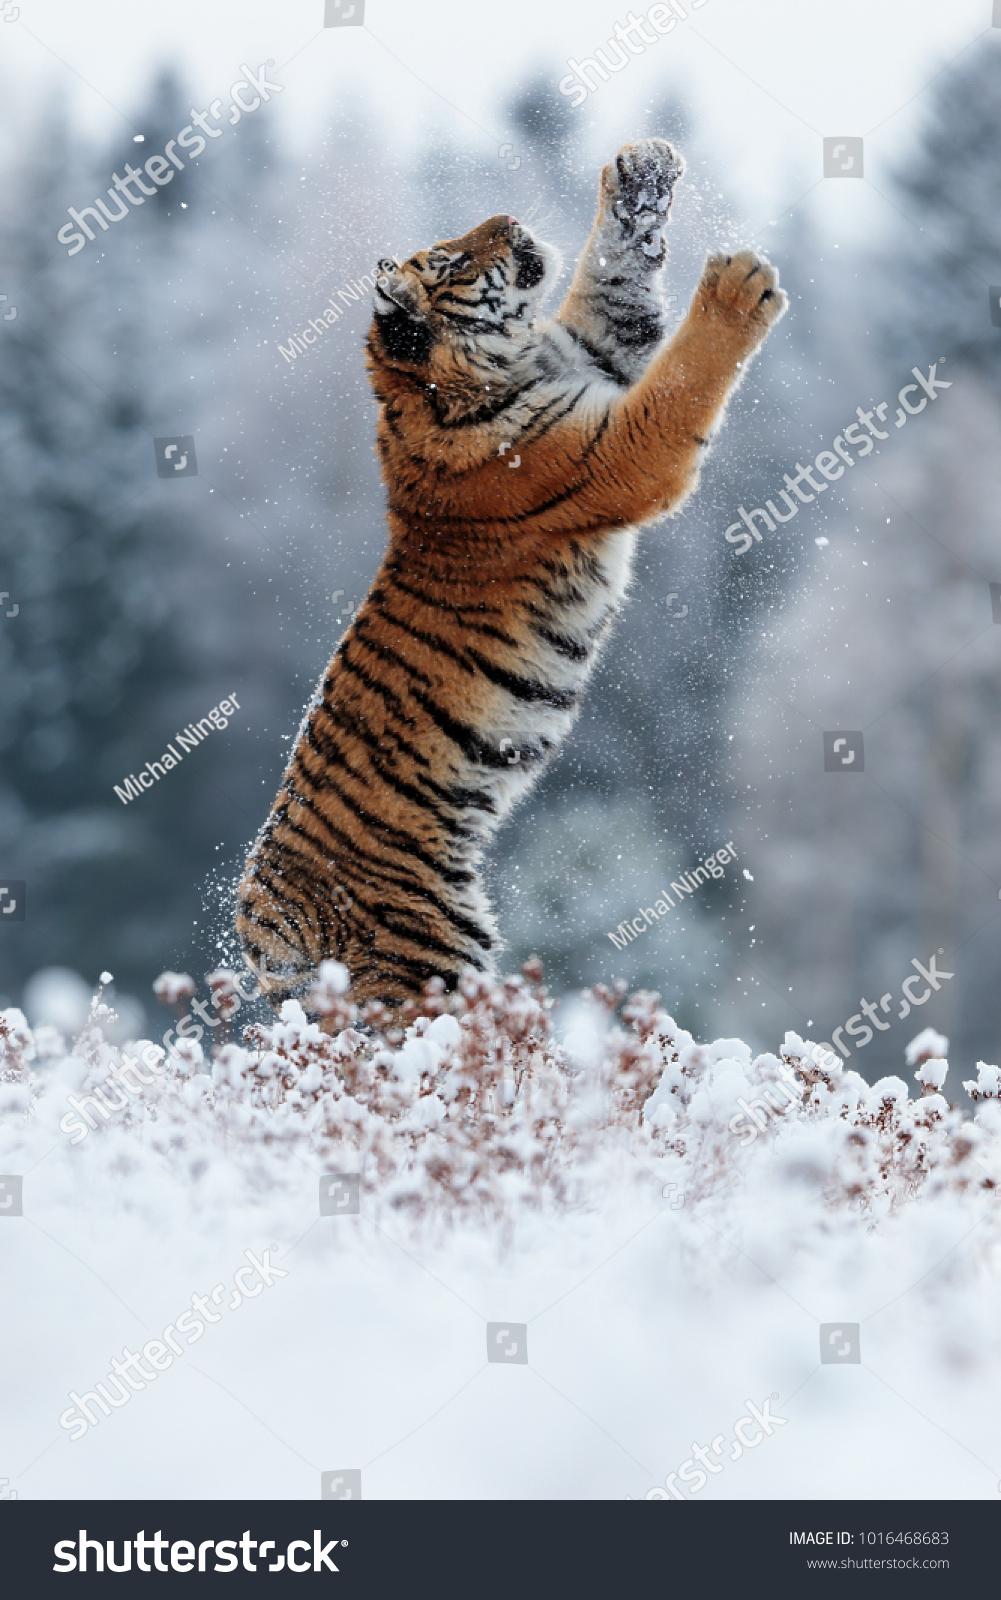 stock-photo-siberian-tiger-wants-to-hunt